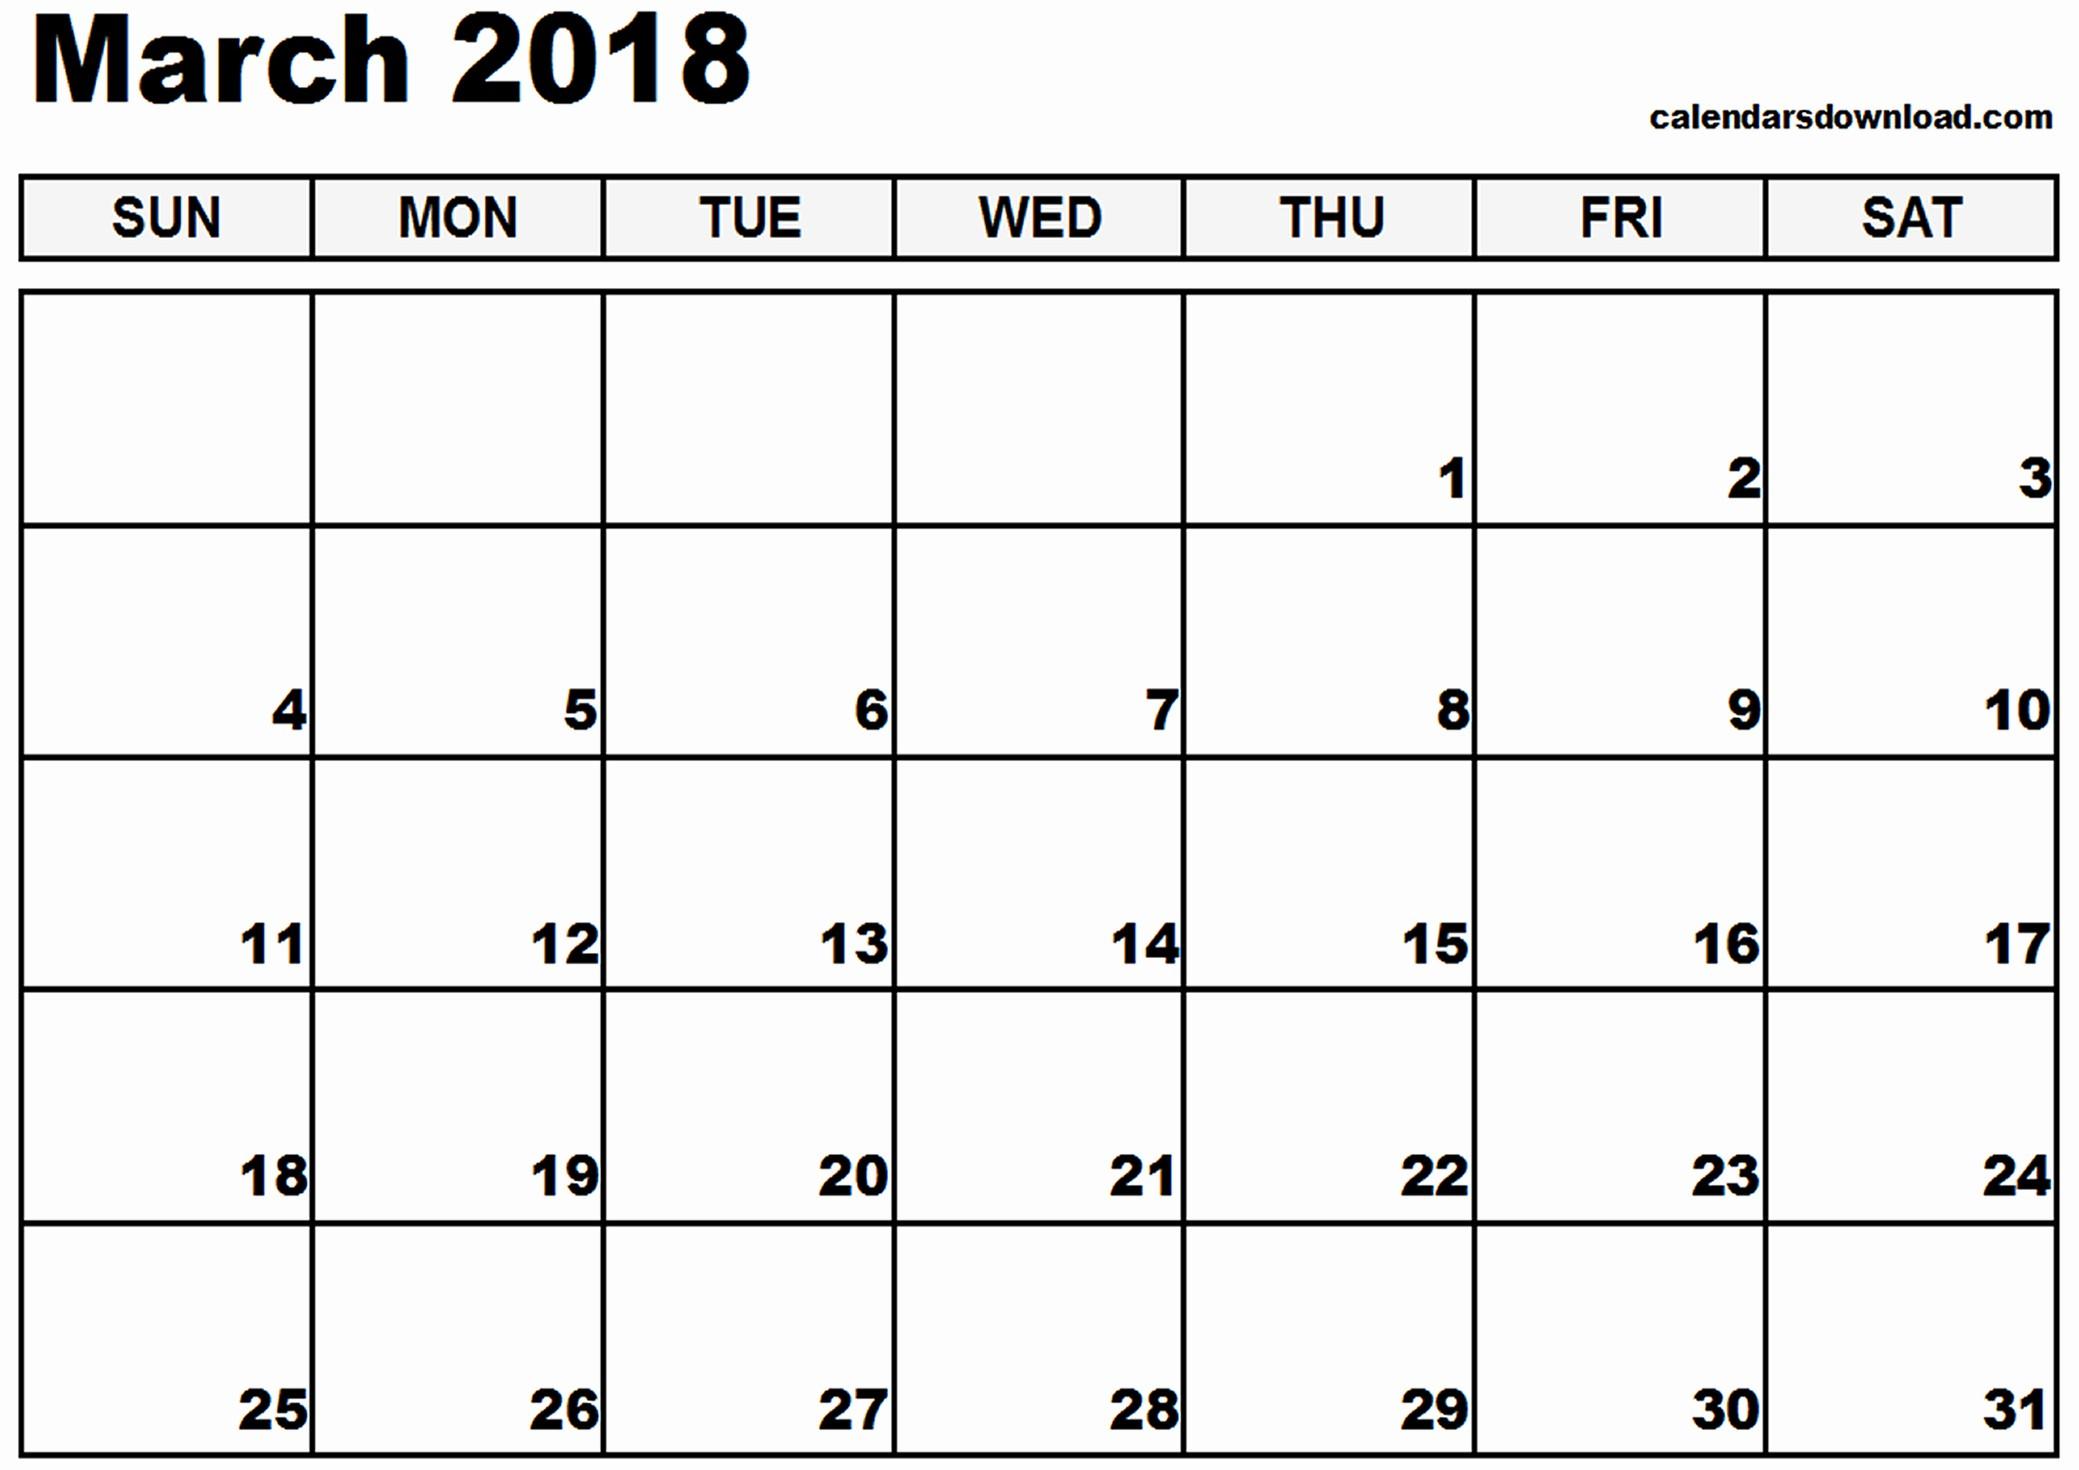 Free Printable 2018 Calendar Templates Awesome March 2018 Calendar Template